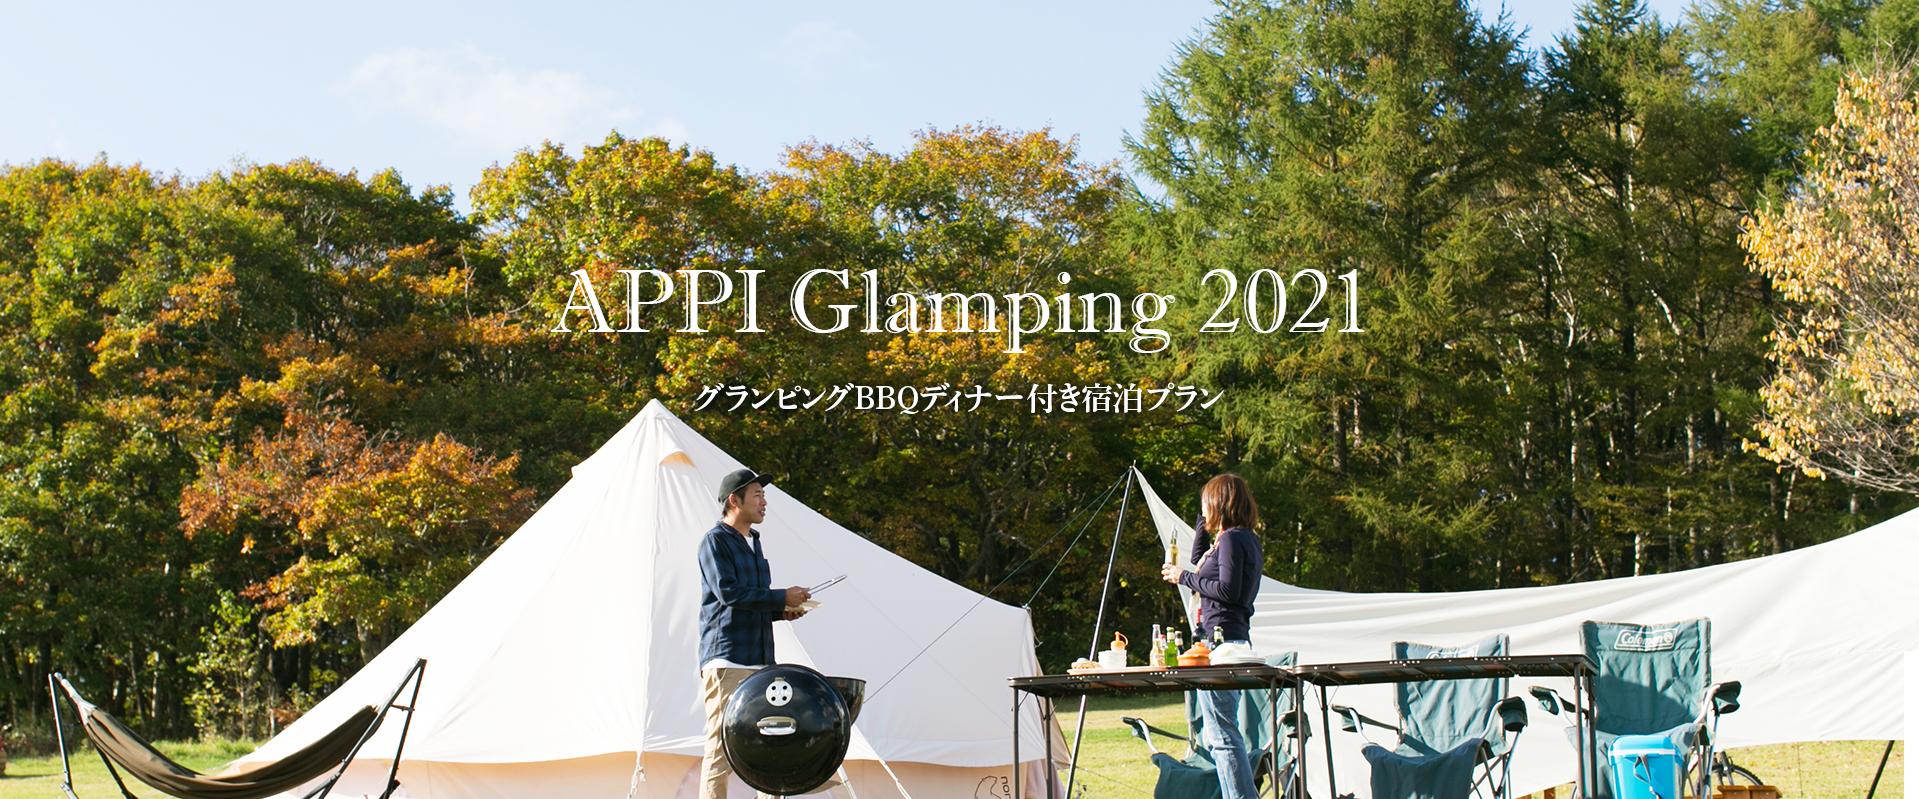 APPI Glamping 安比グランピング